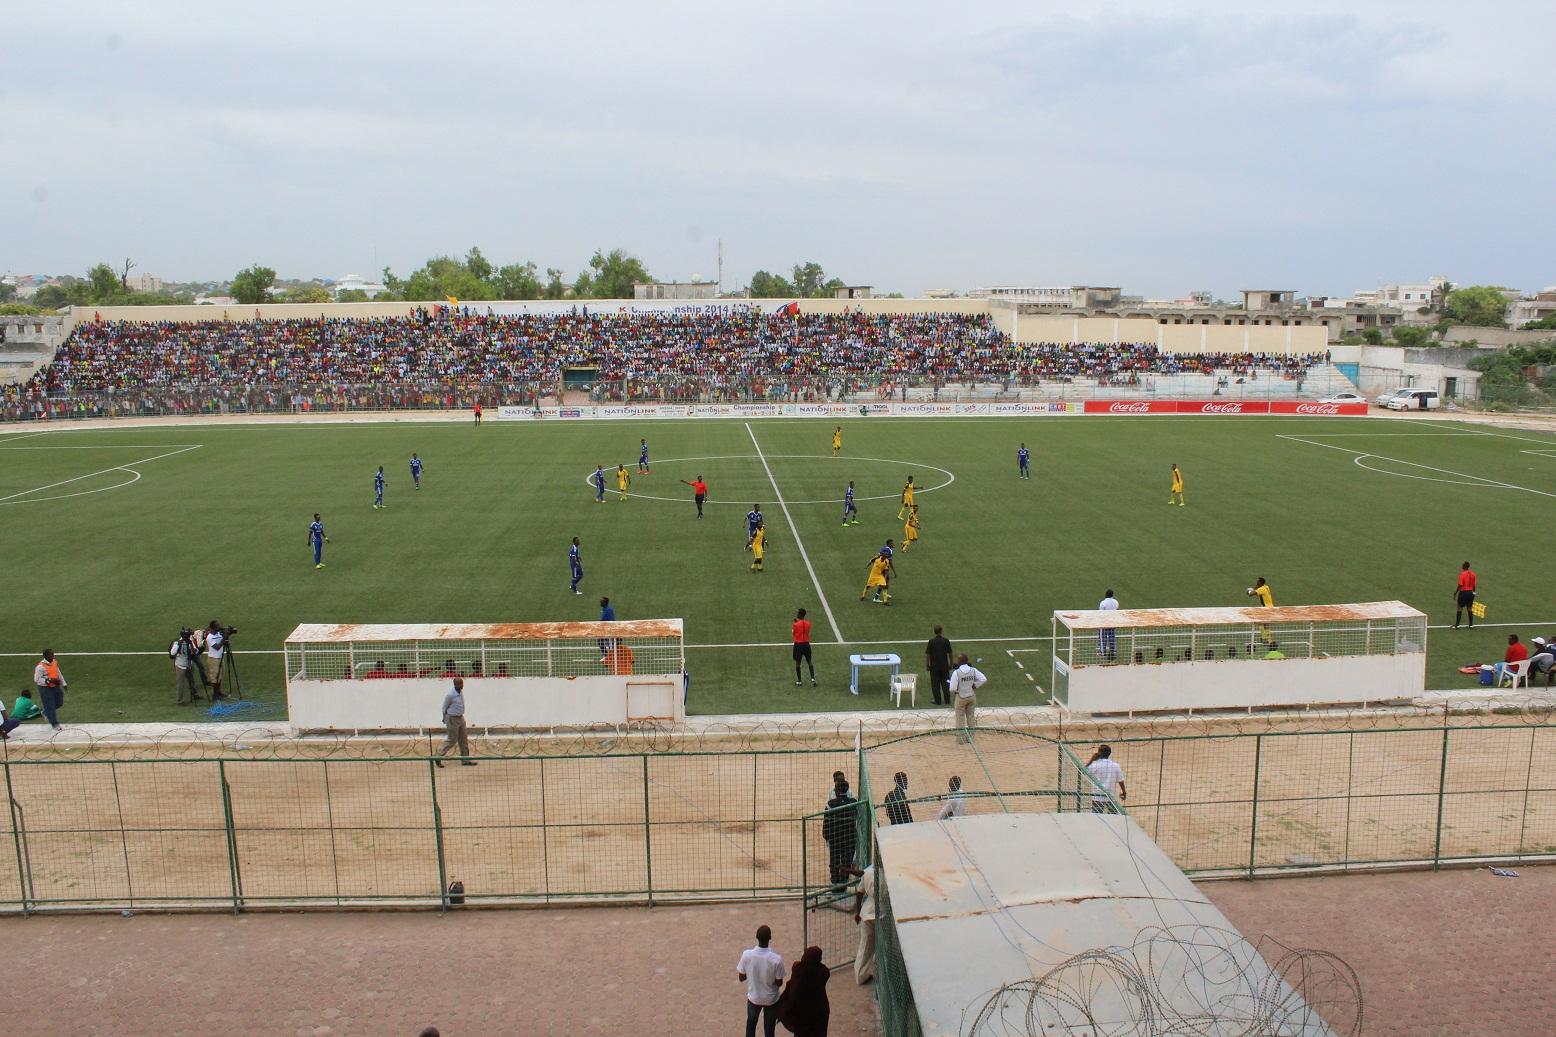 Pertandingan Bola di Somalia Kacau oleh Bom, 5 Nyawa Melayang